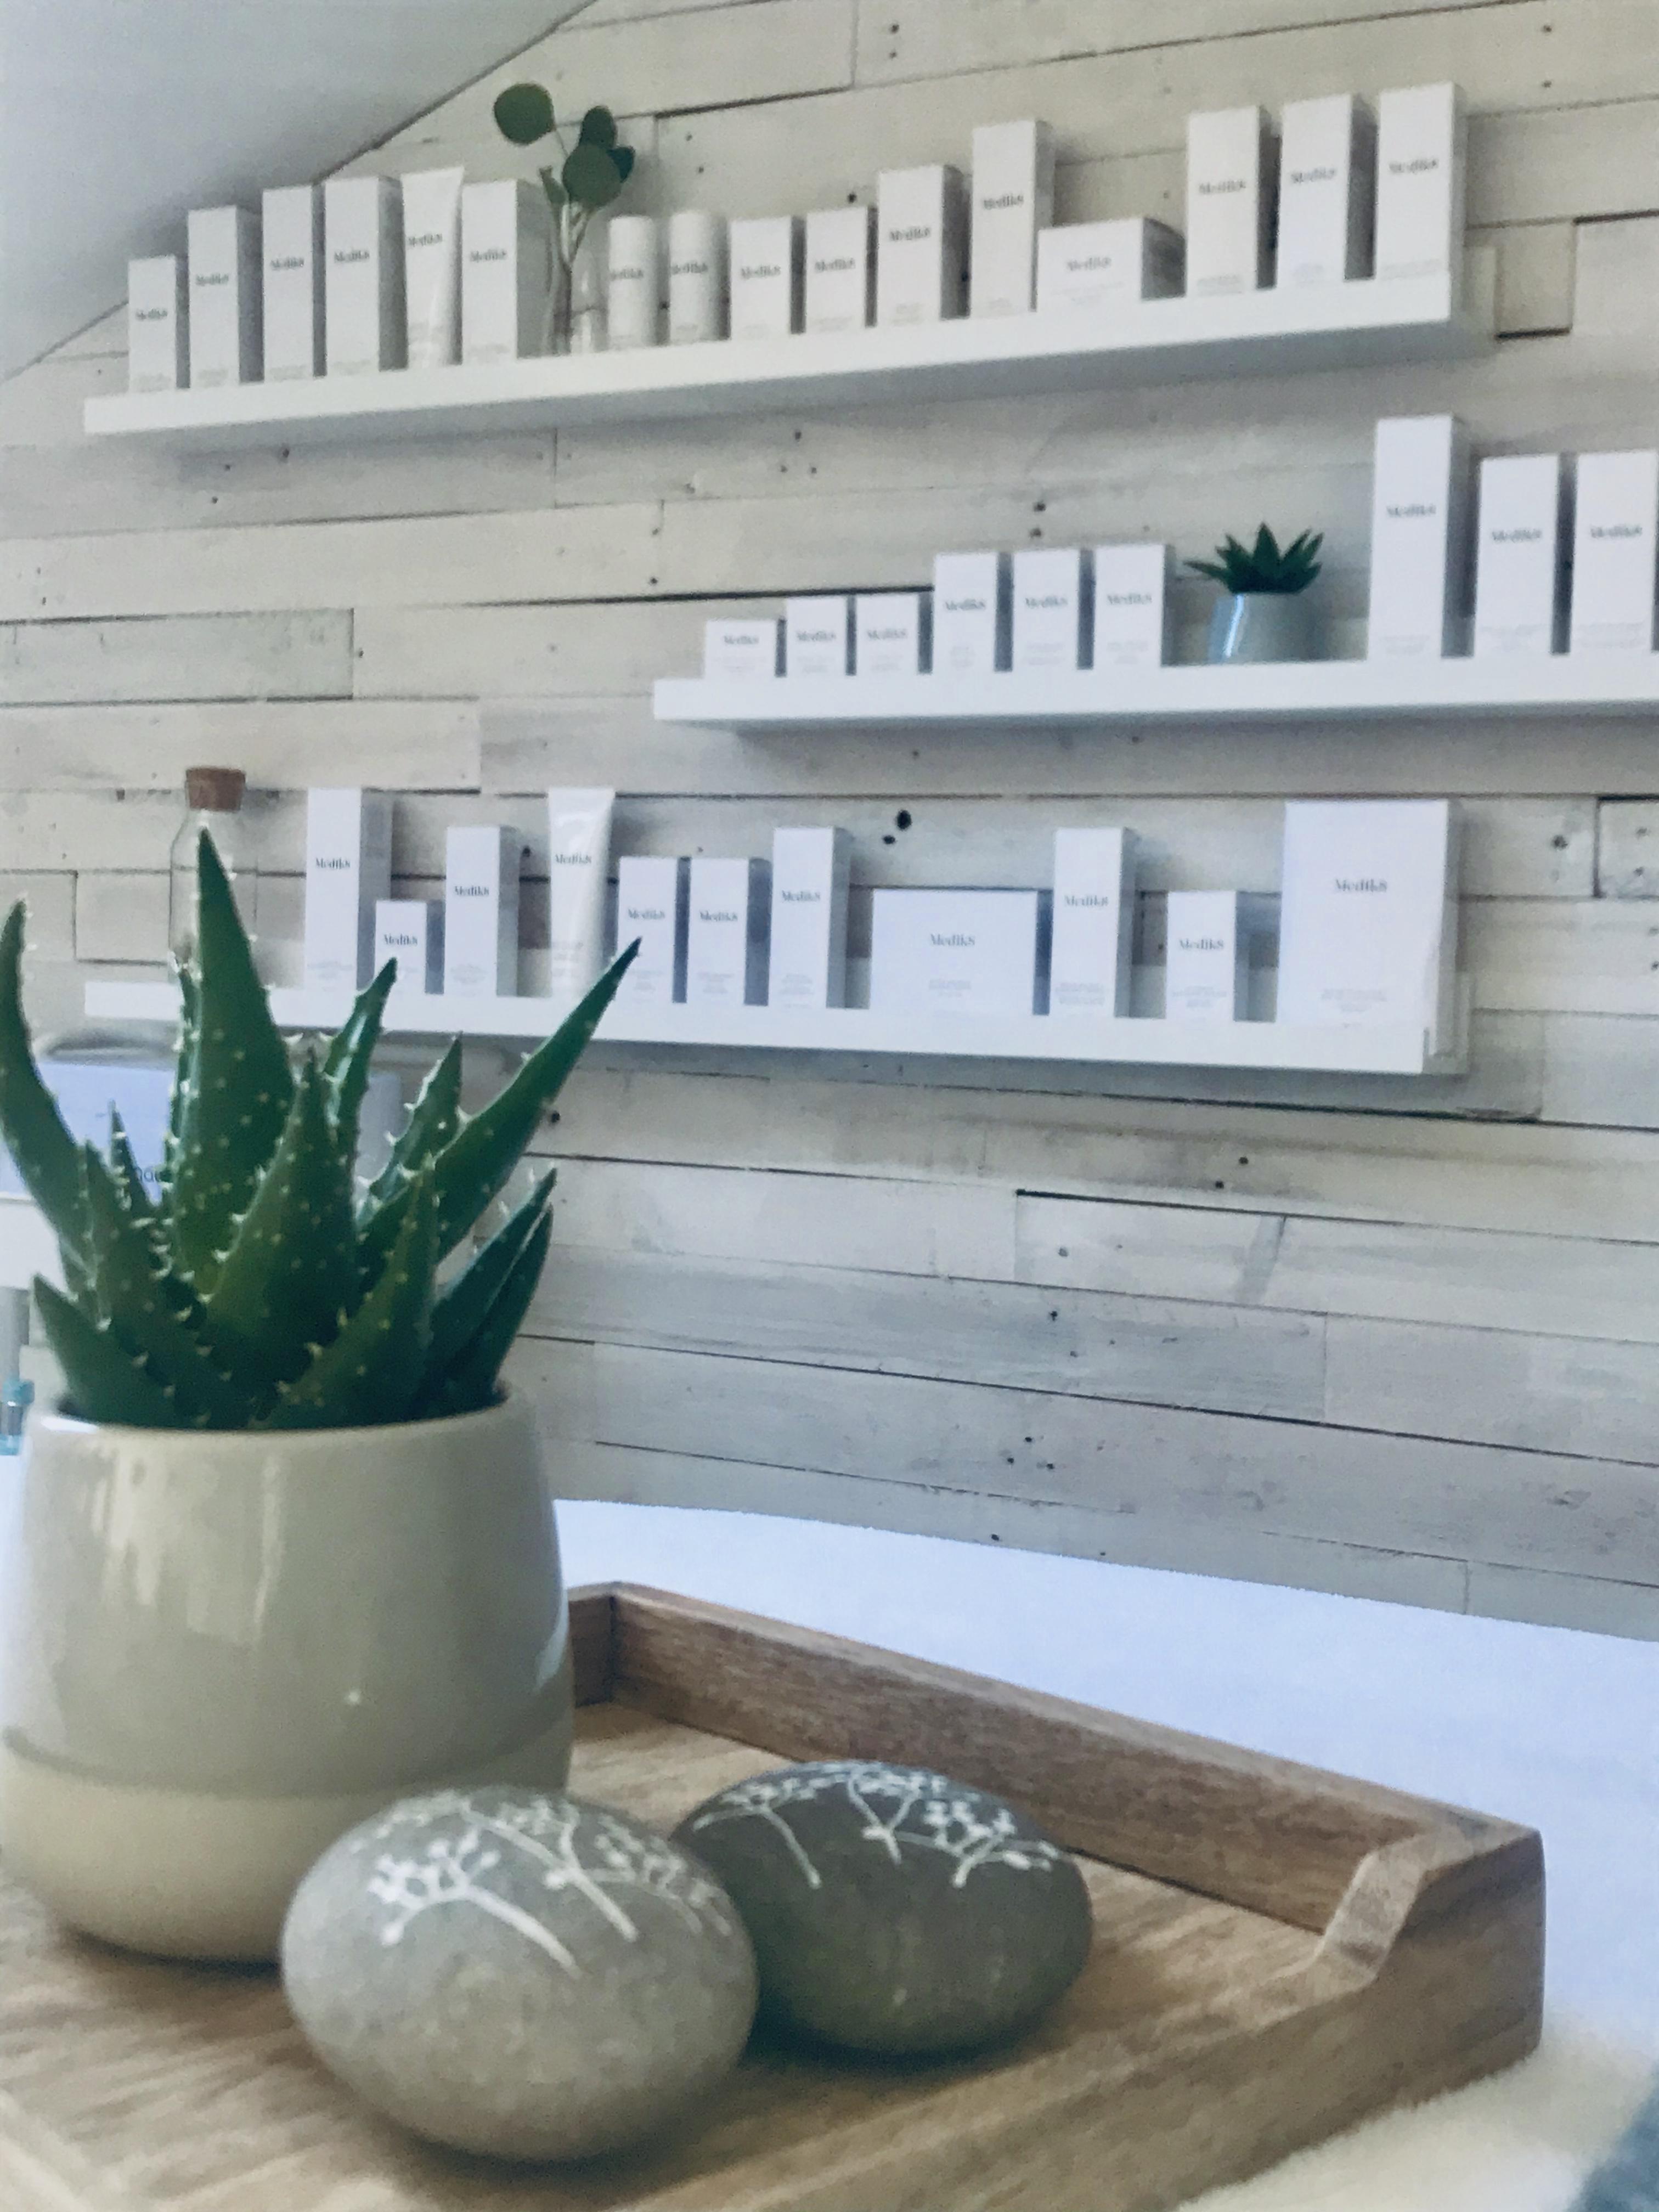 SkinLab Boutique opens in Barton Le Clay